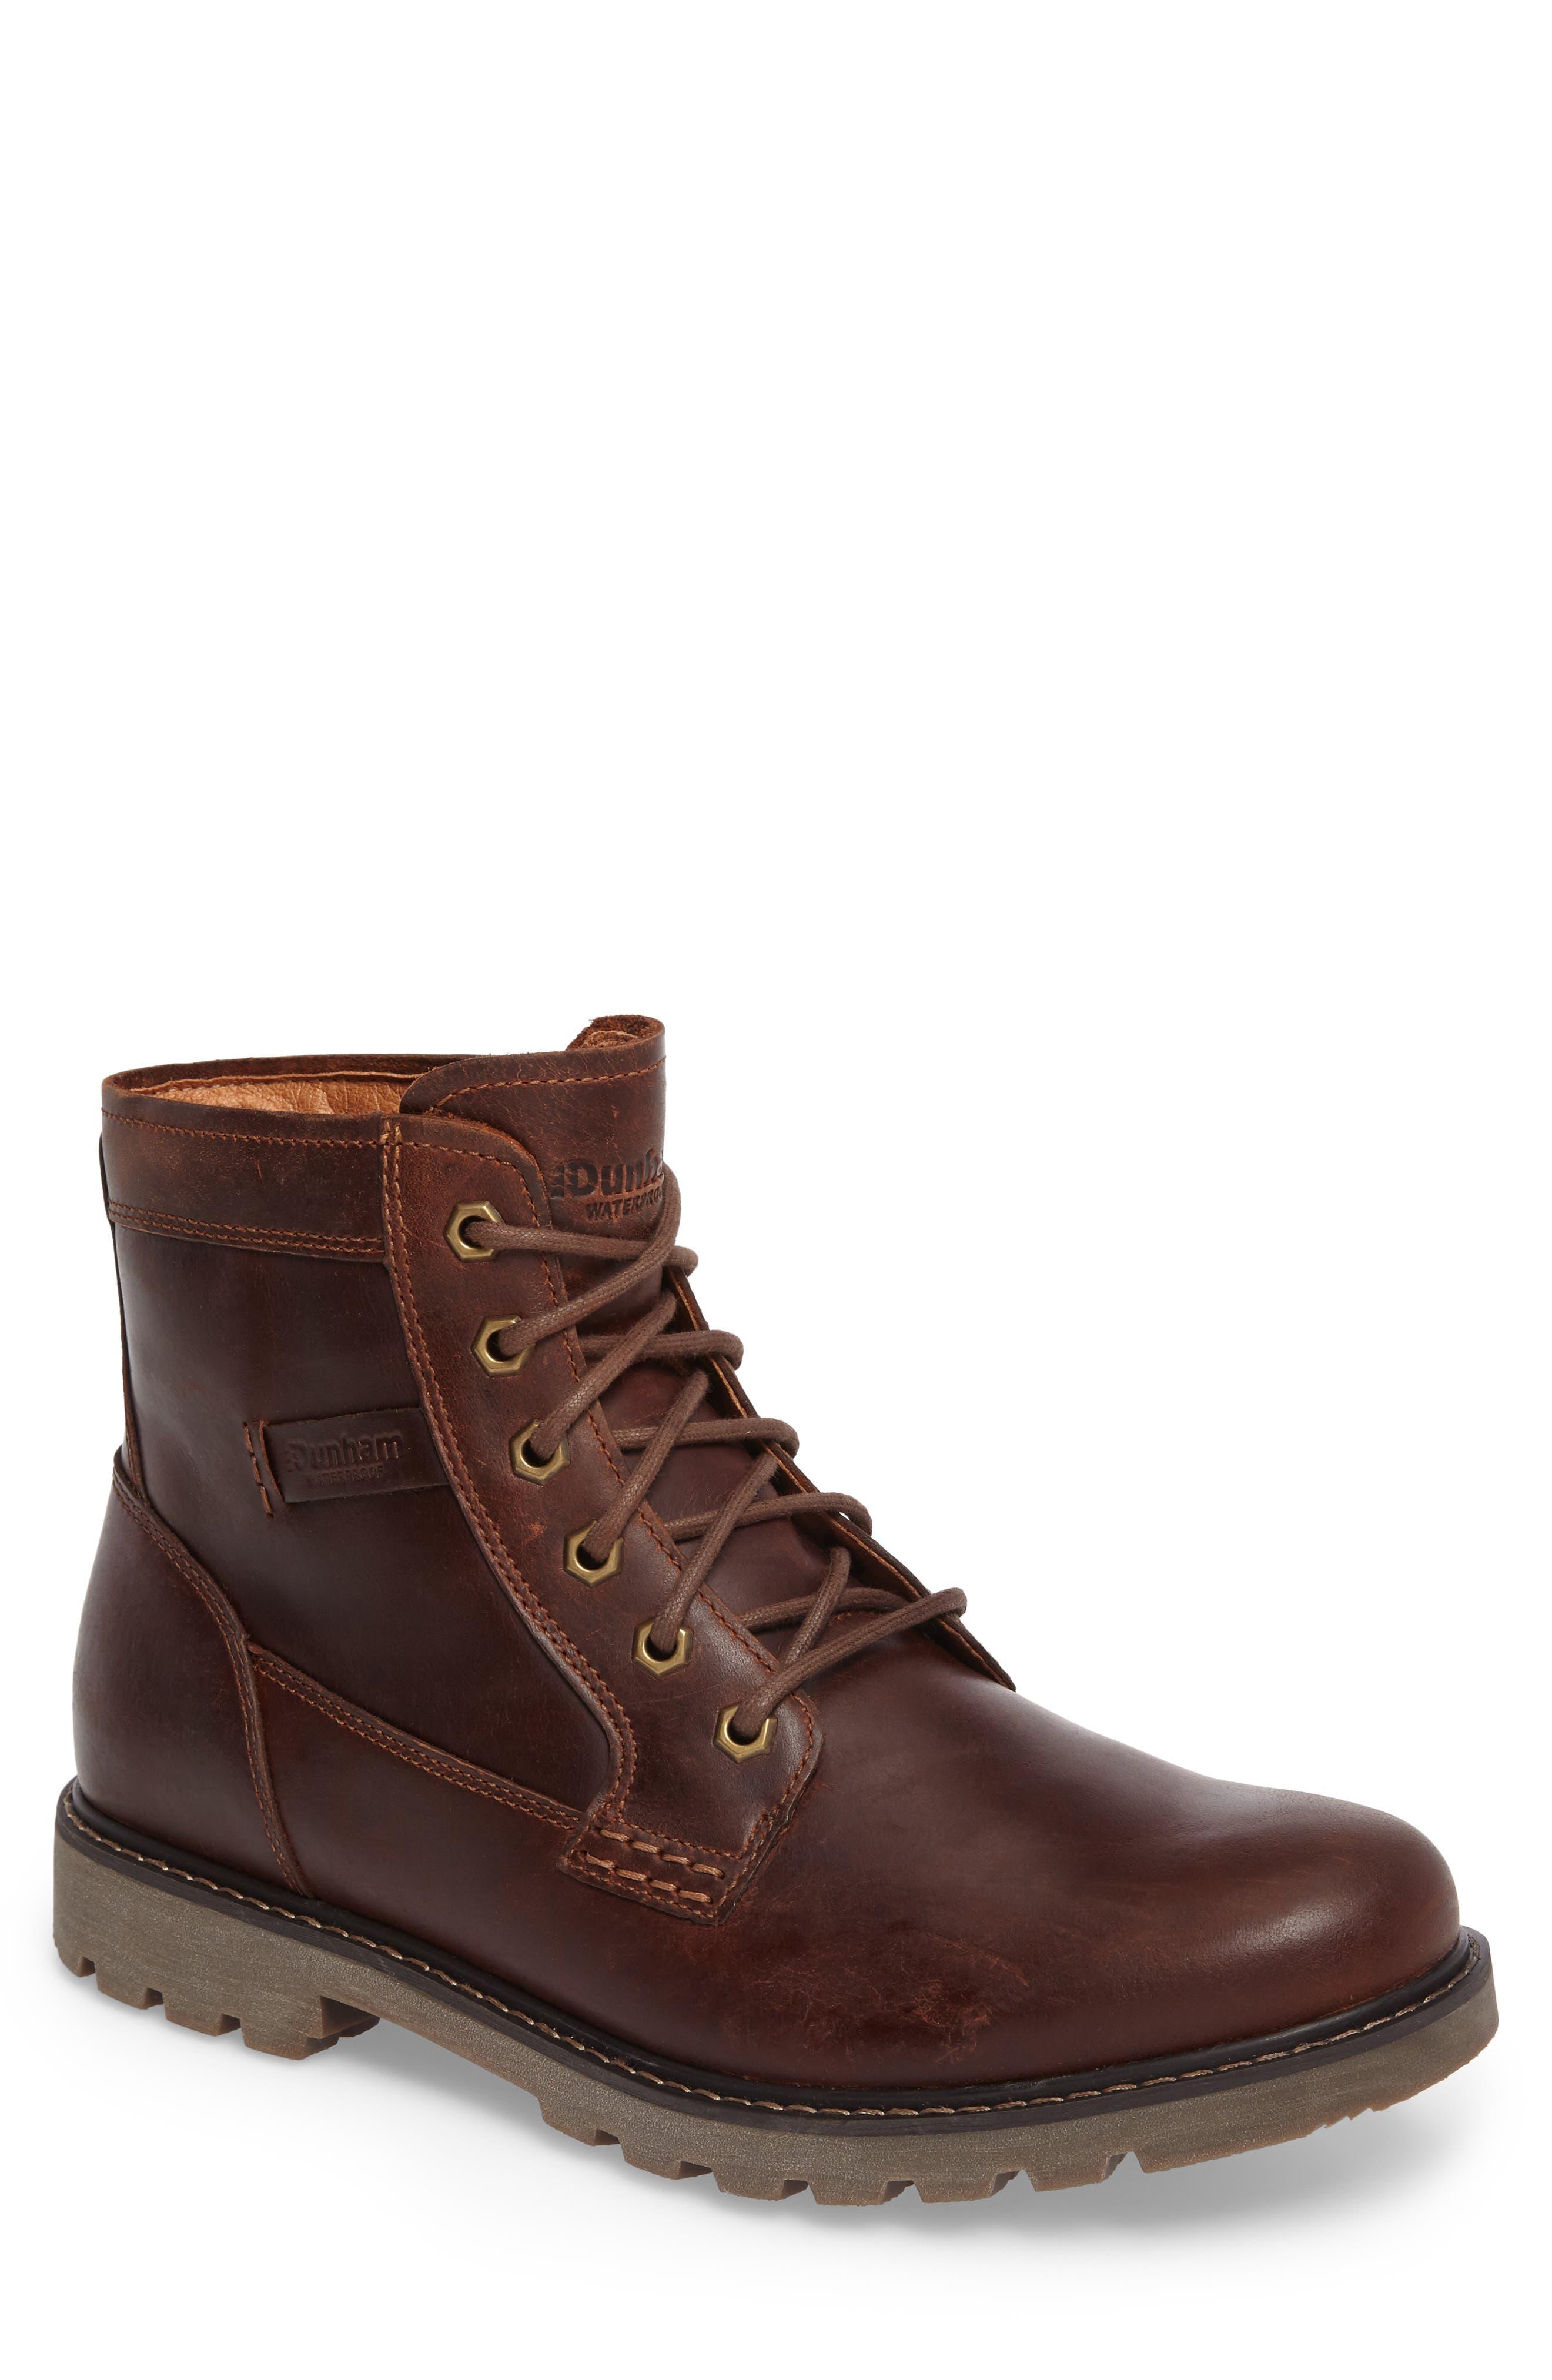 Dunham Royalton Plain Toe Boot EEEE - Brown